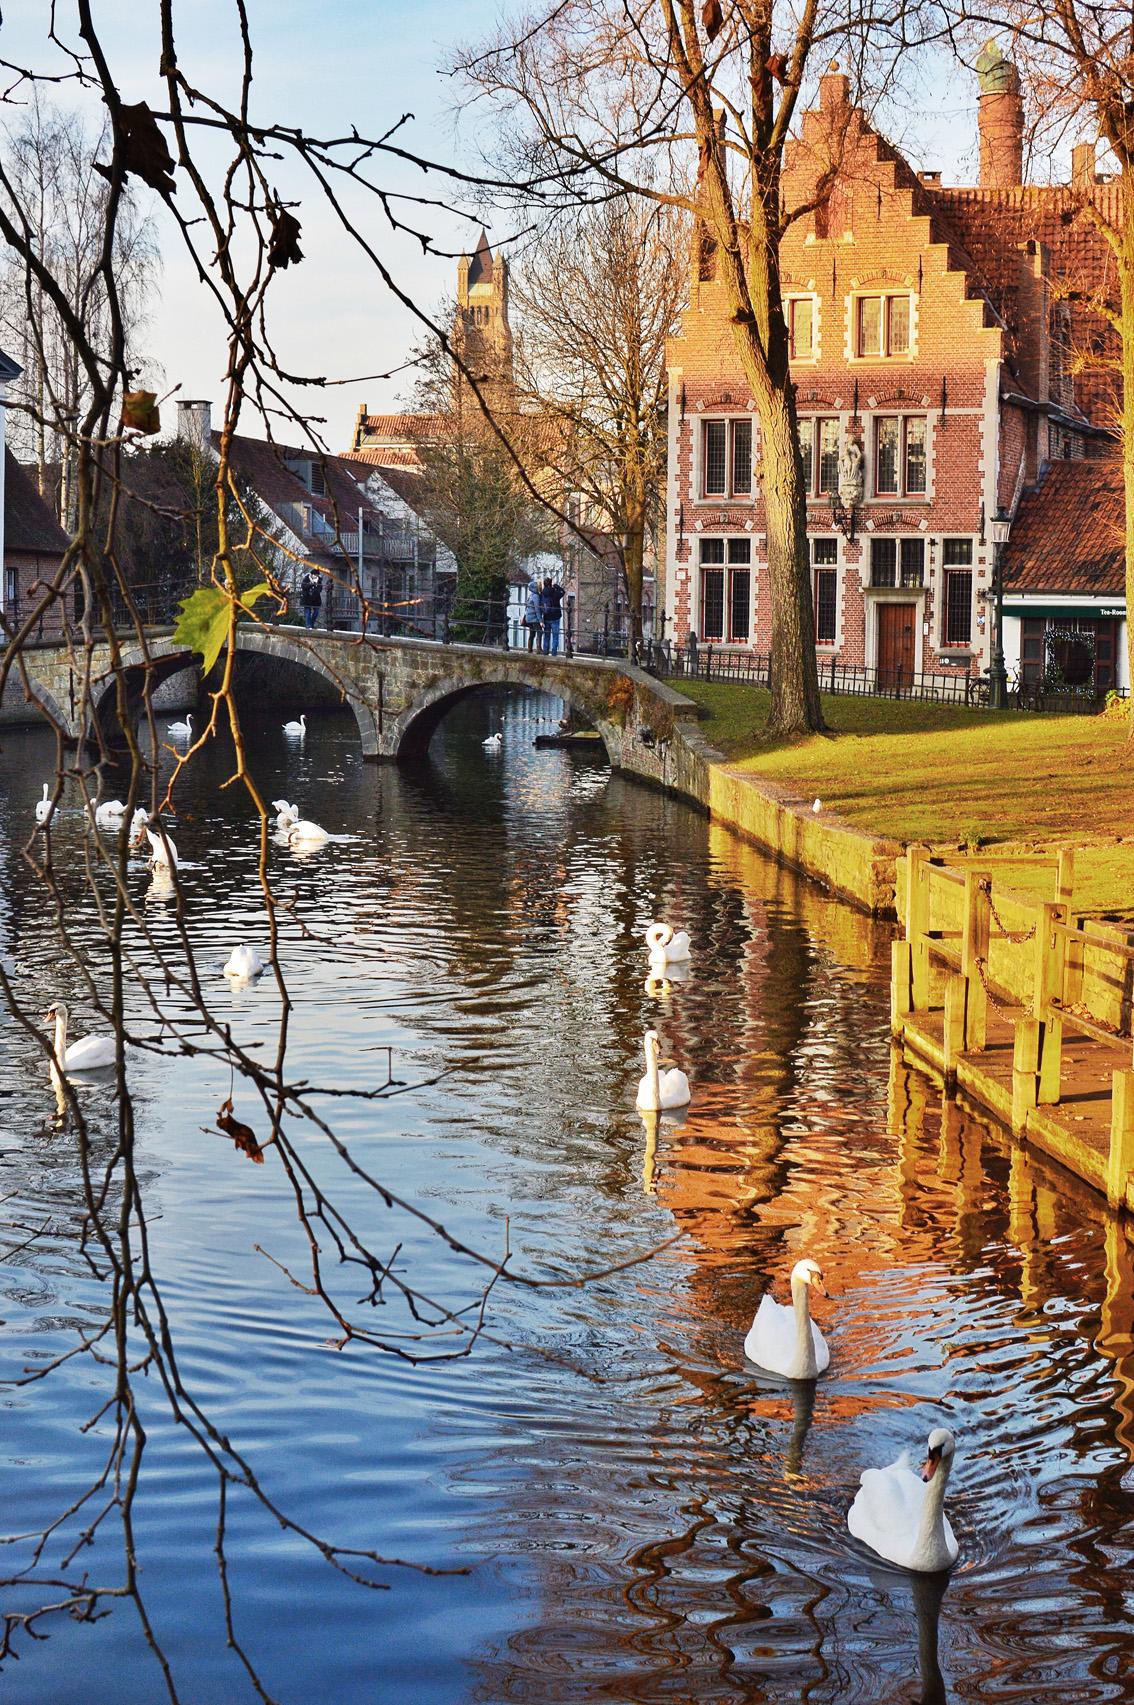 16-2 Un weekend in Belgio. Alla scoperta delle Fiandre: Bruges .